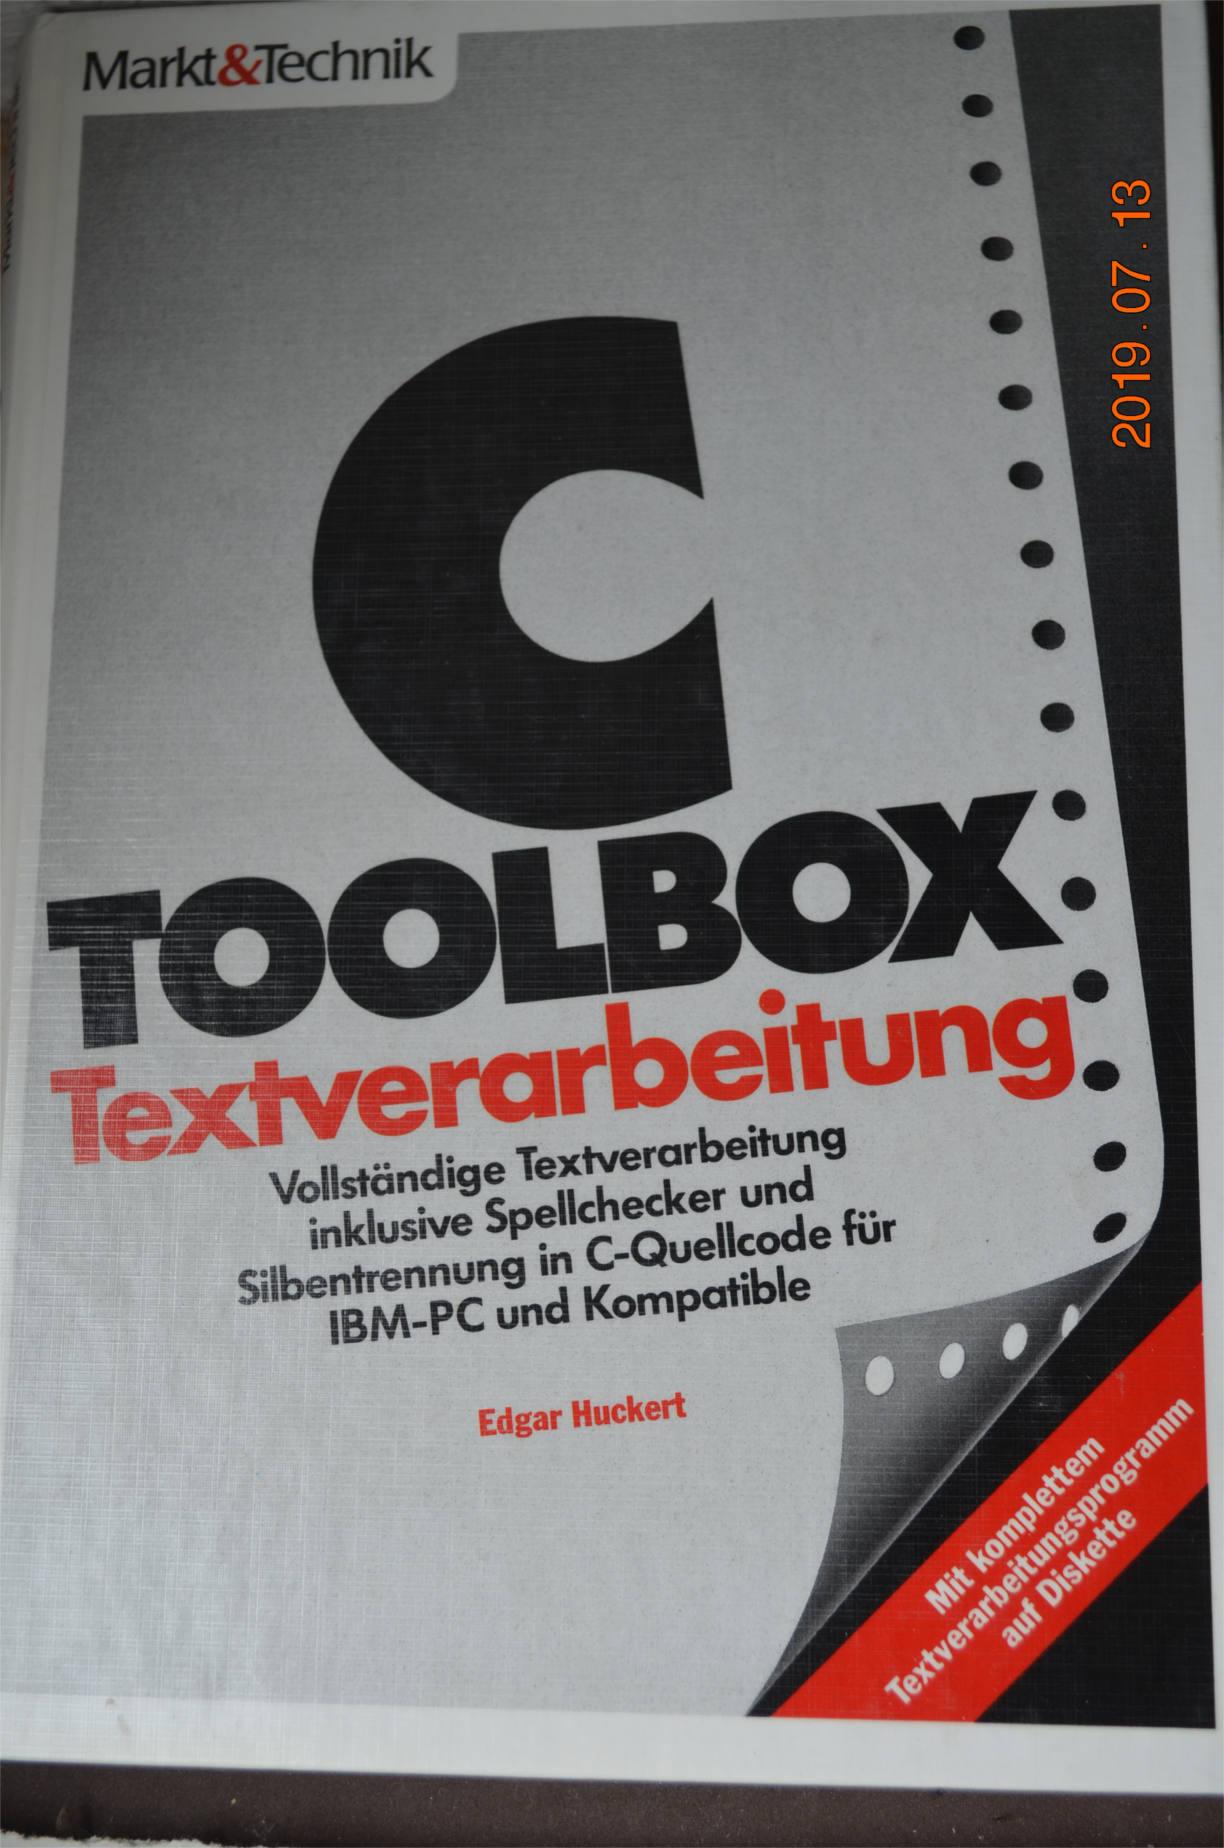 Edgar Huckert: Programming languages